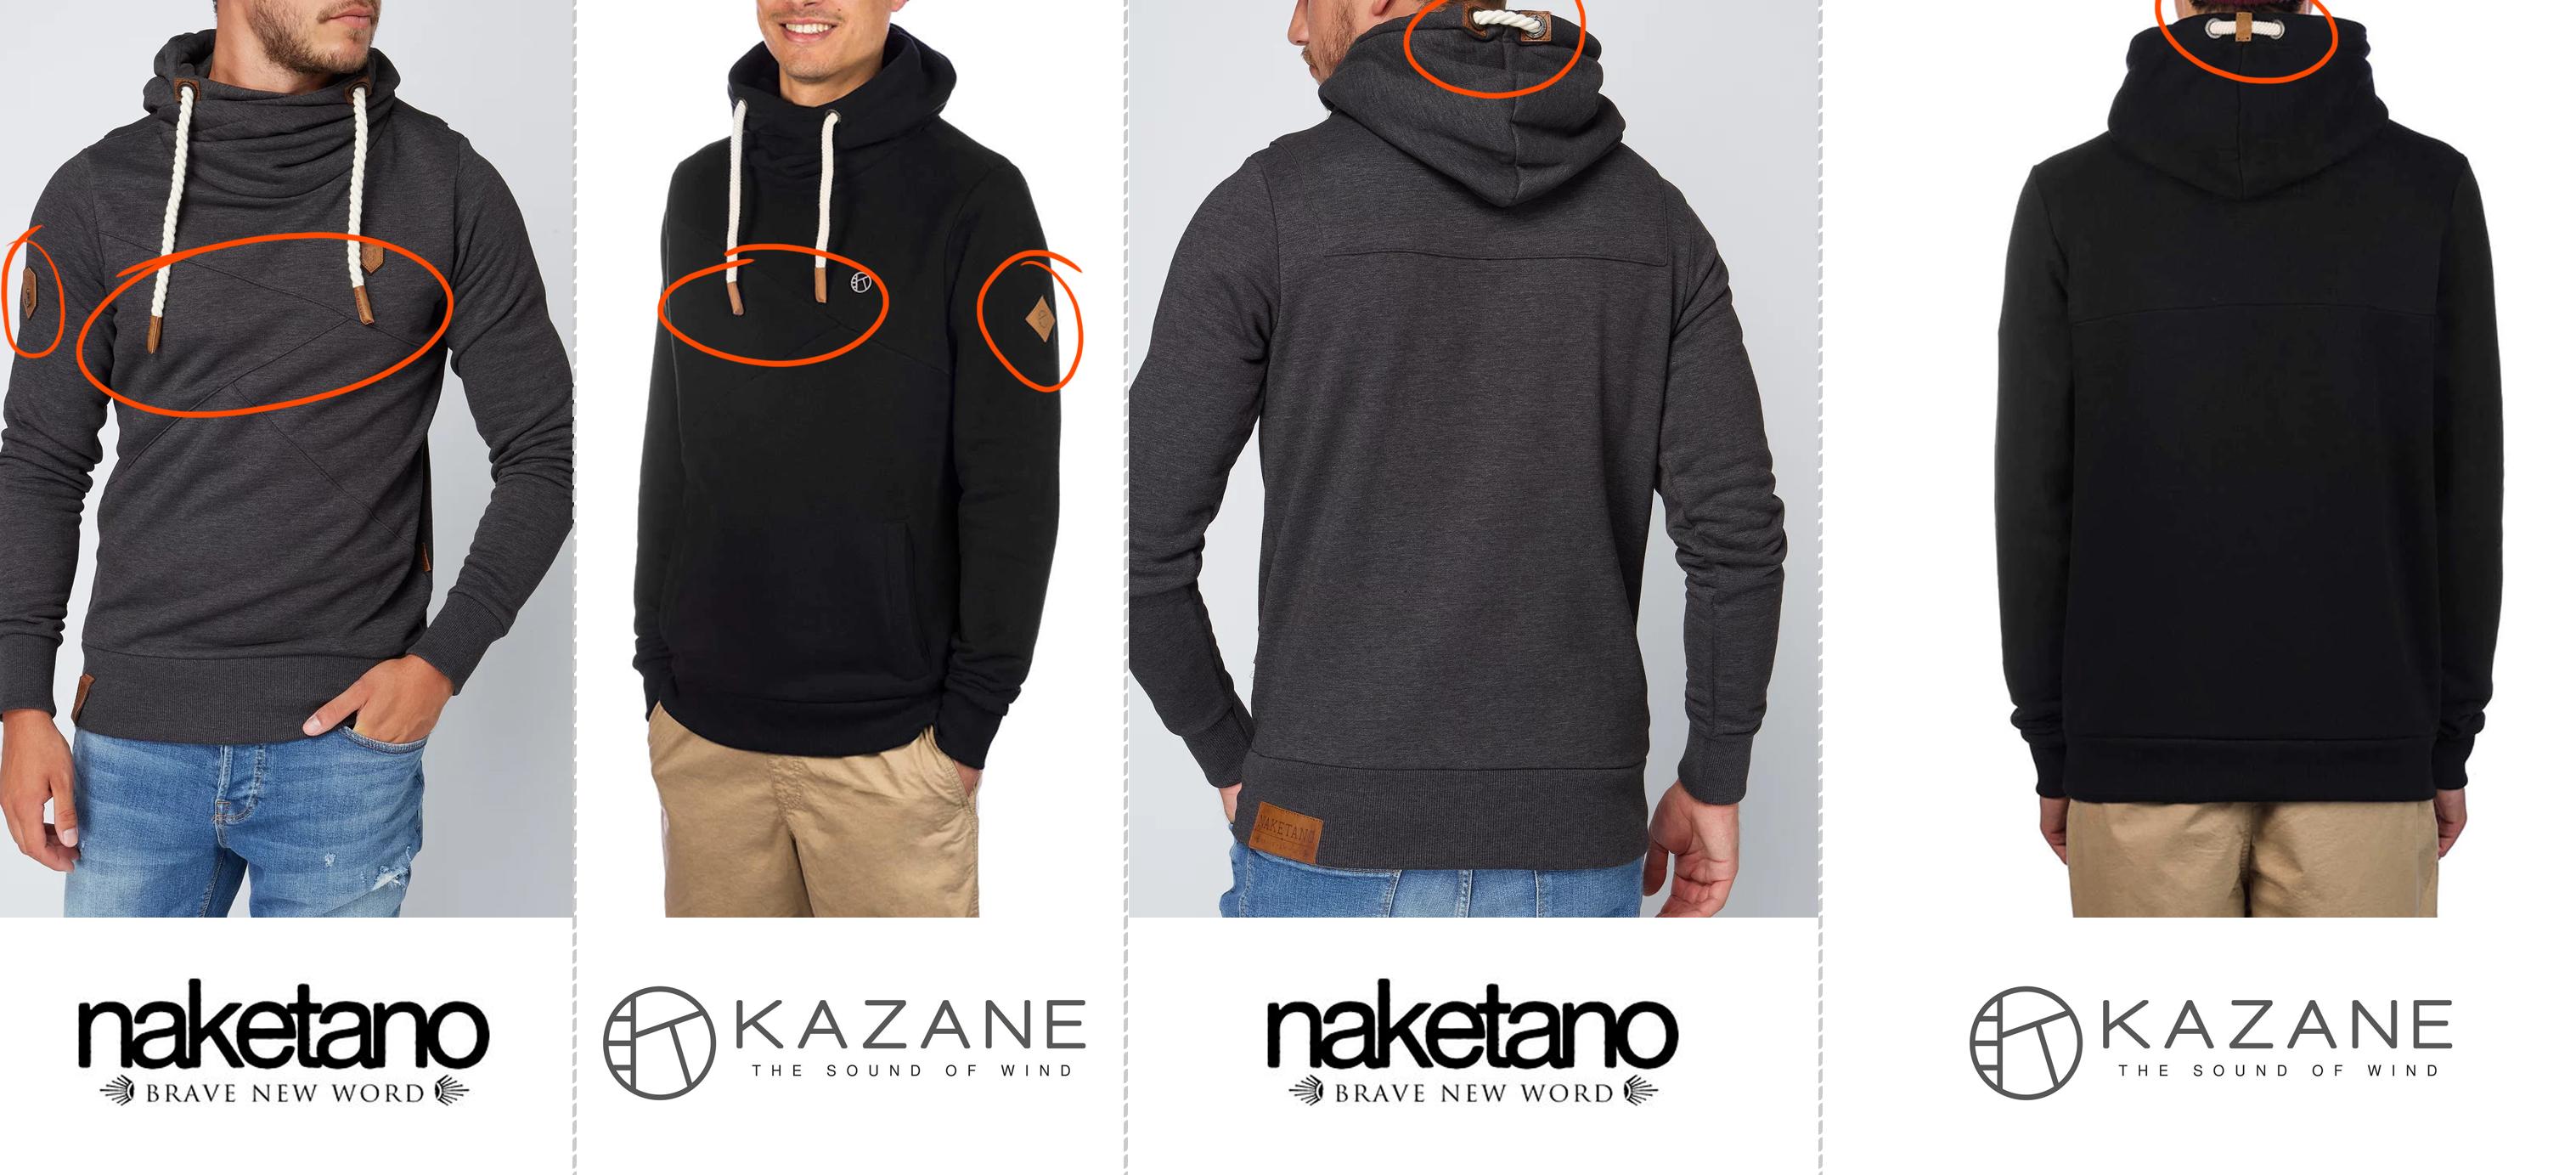 Naketano Kopie? Neue Marke